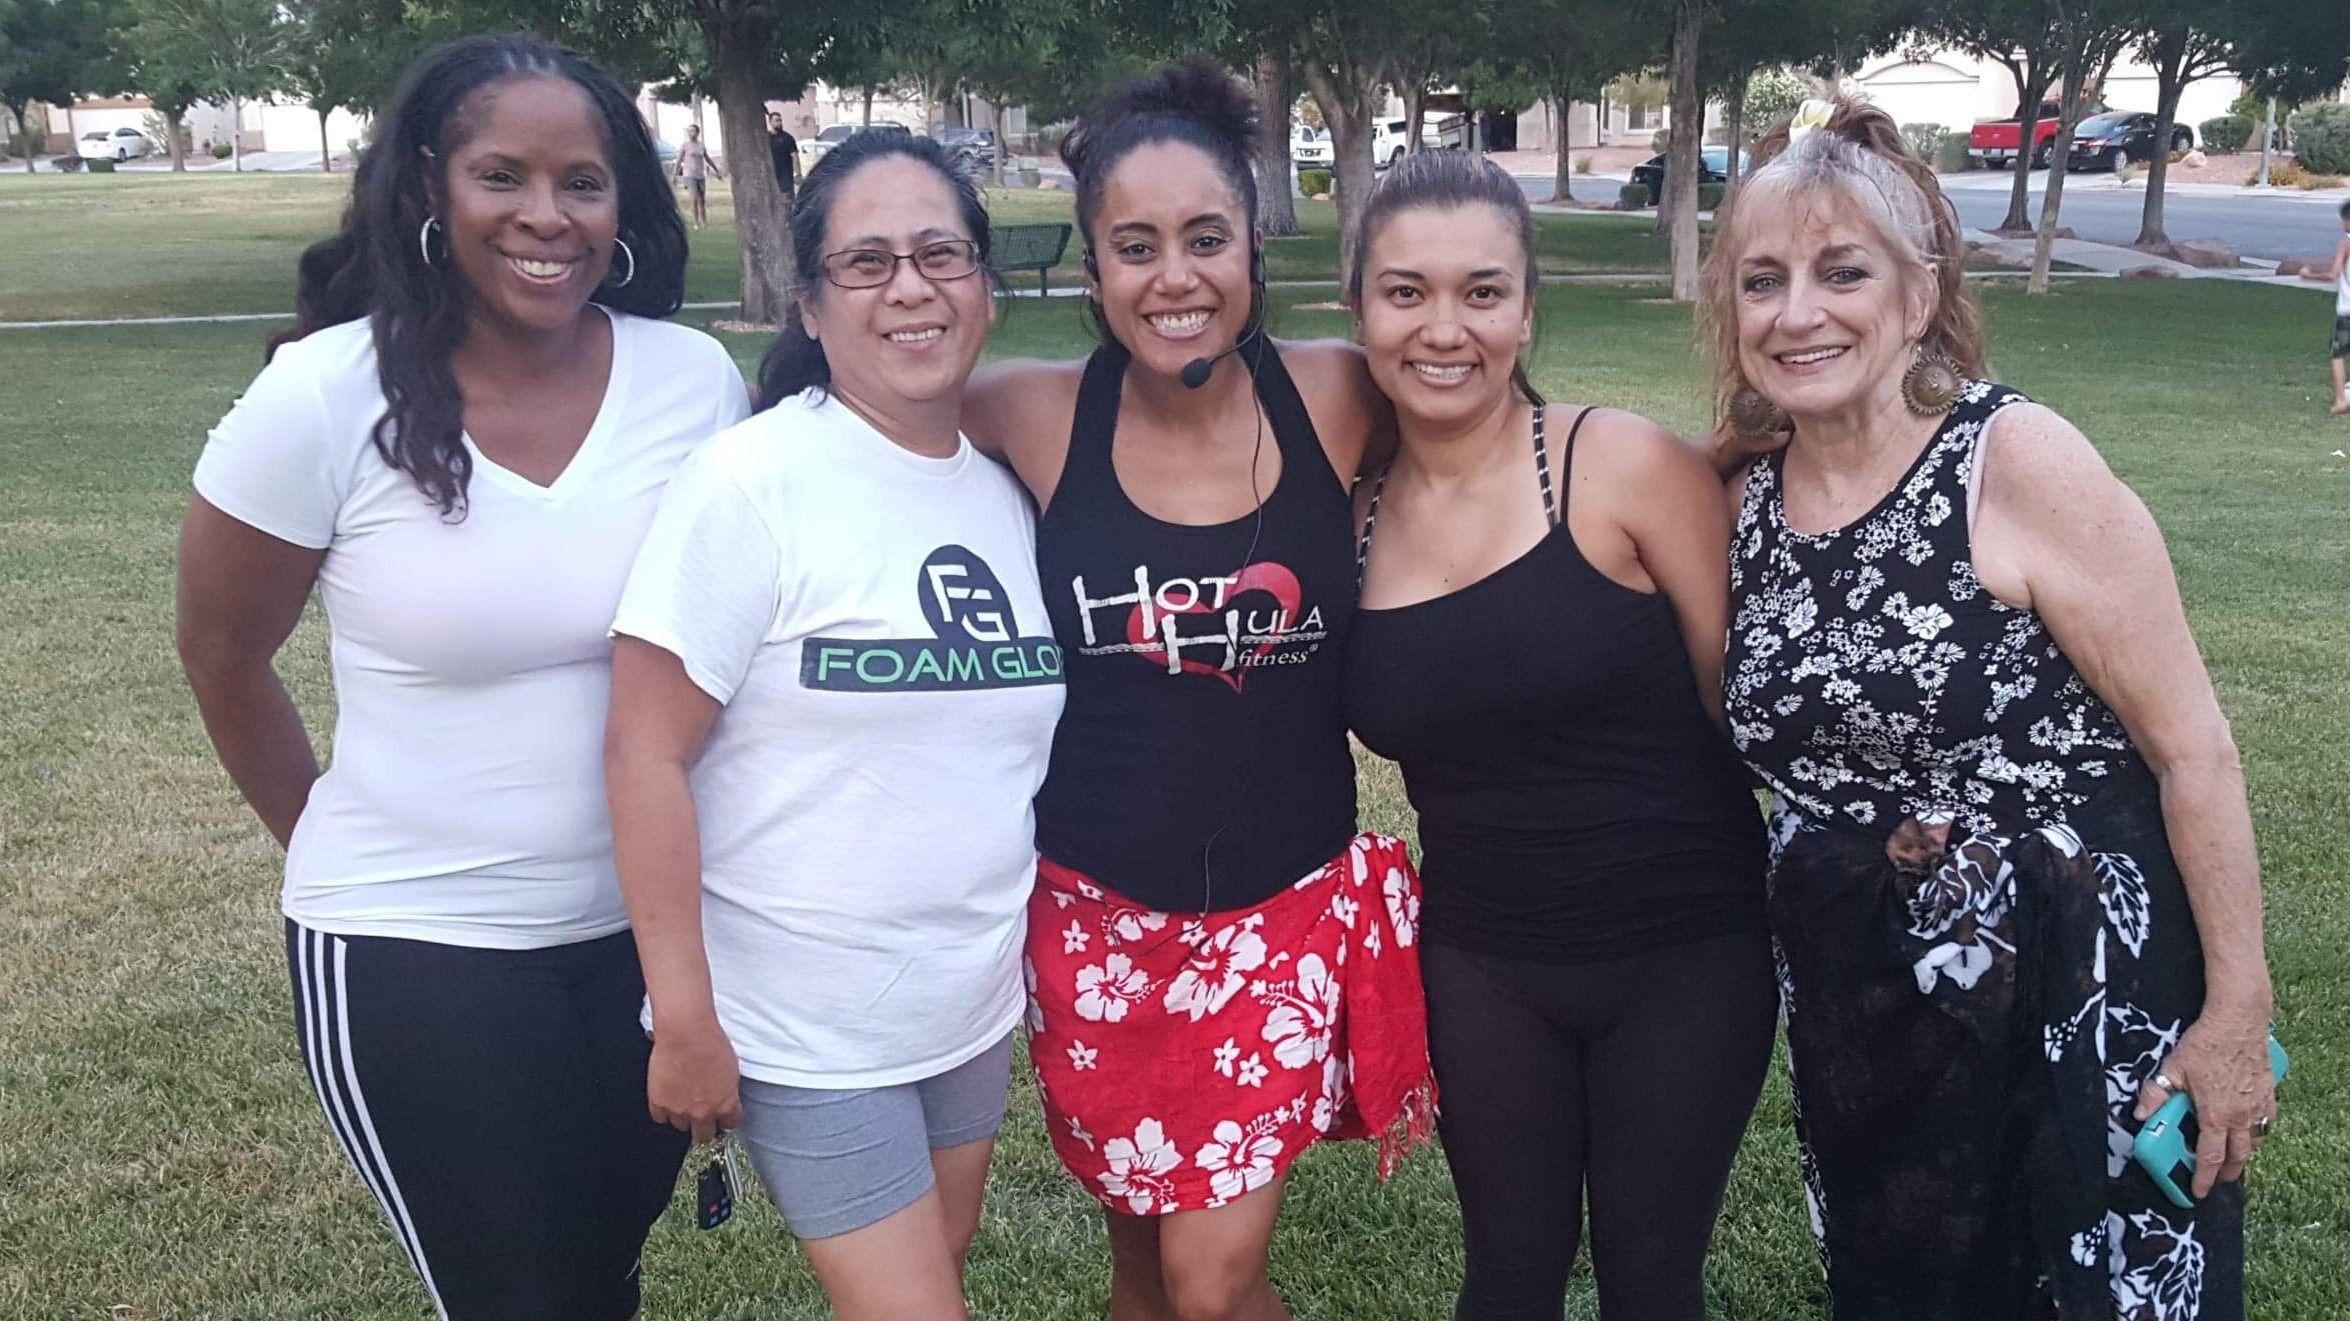 HOT HULA Fitness with 'Lady' Lena